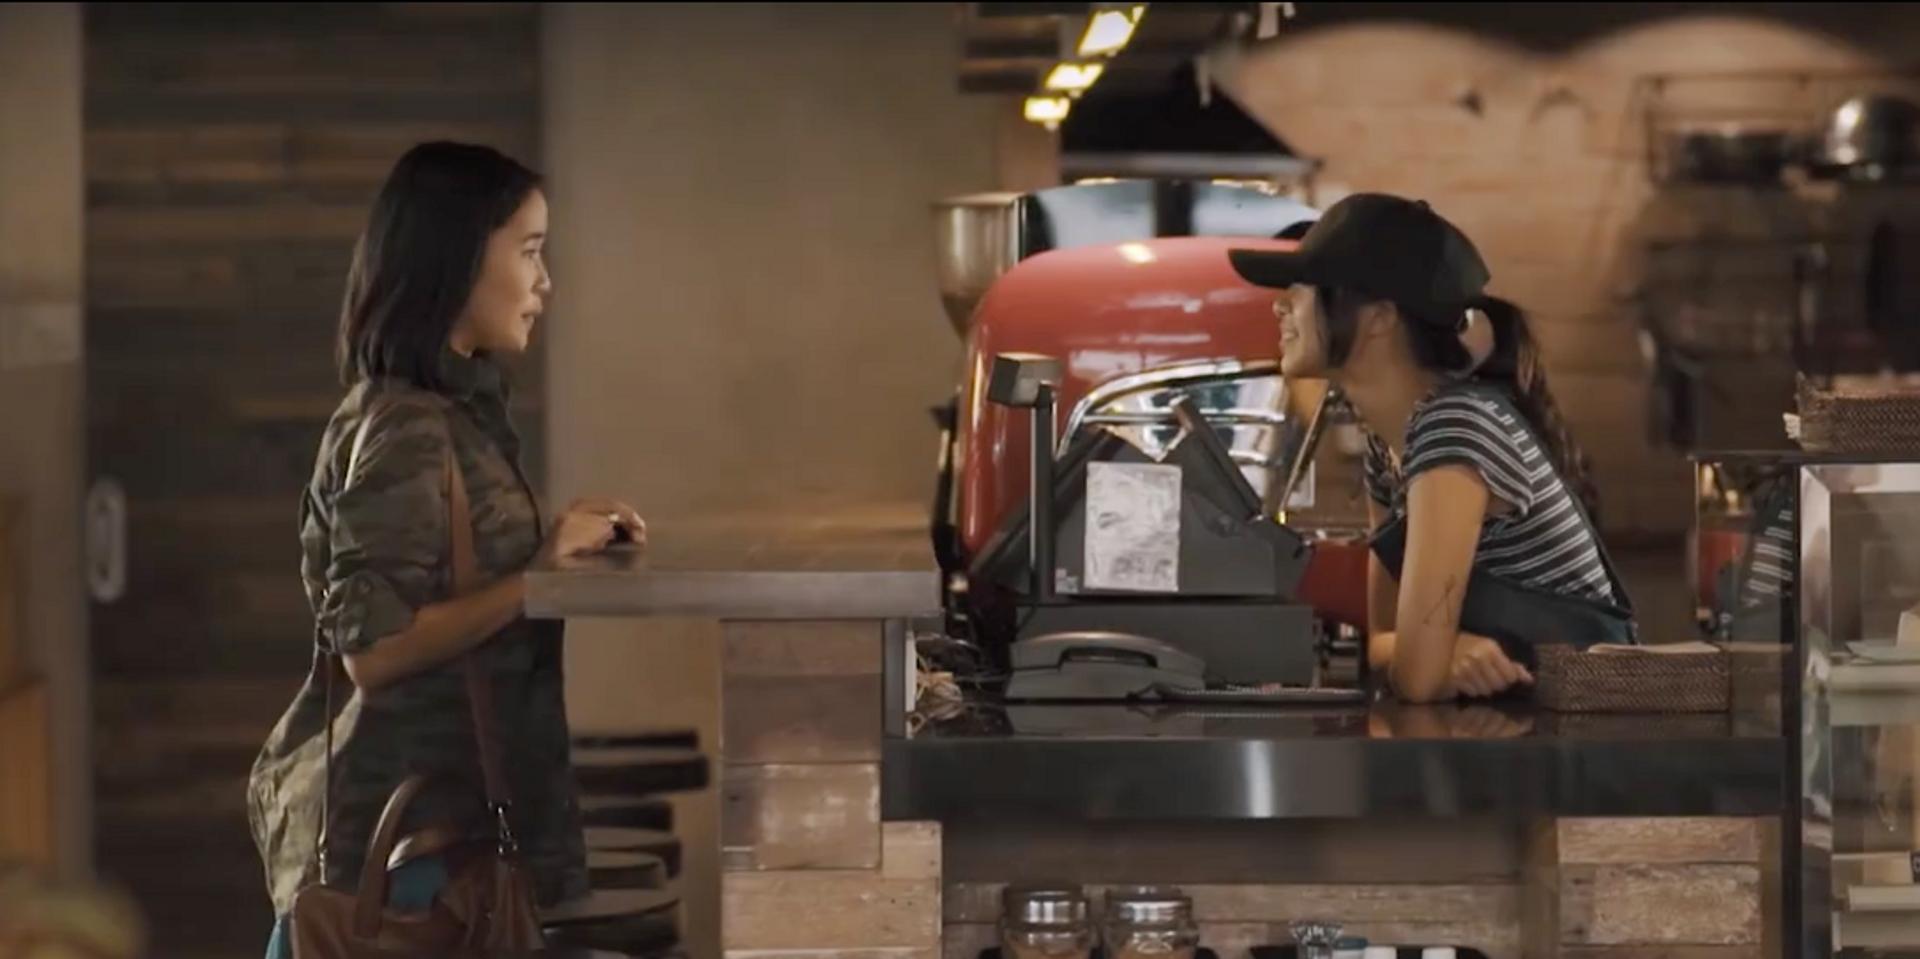 WATCH: Clara Benin's coffee shop music video 'Closure'